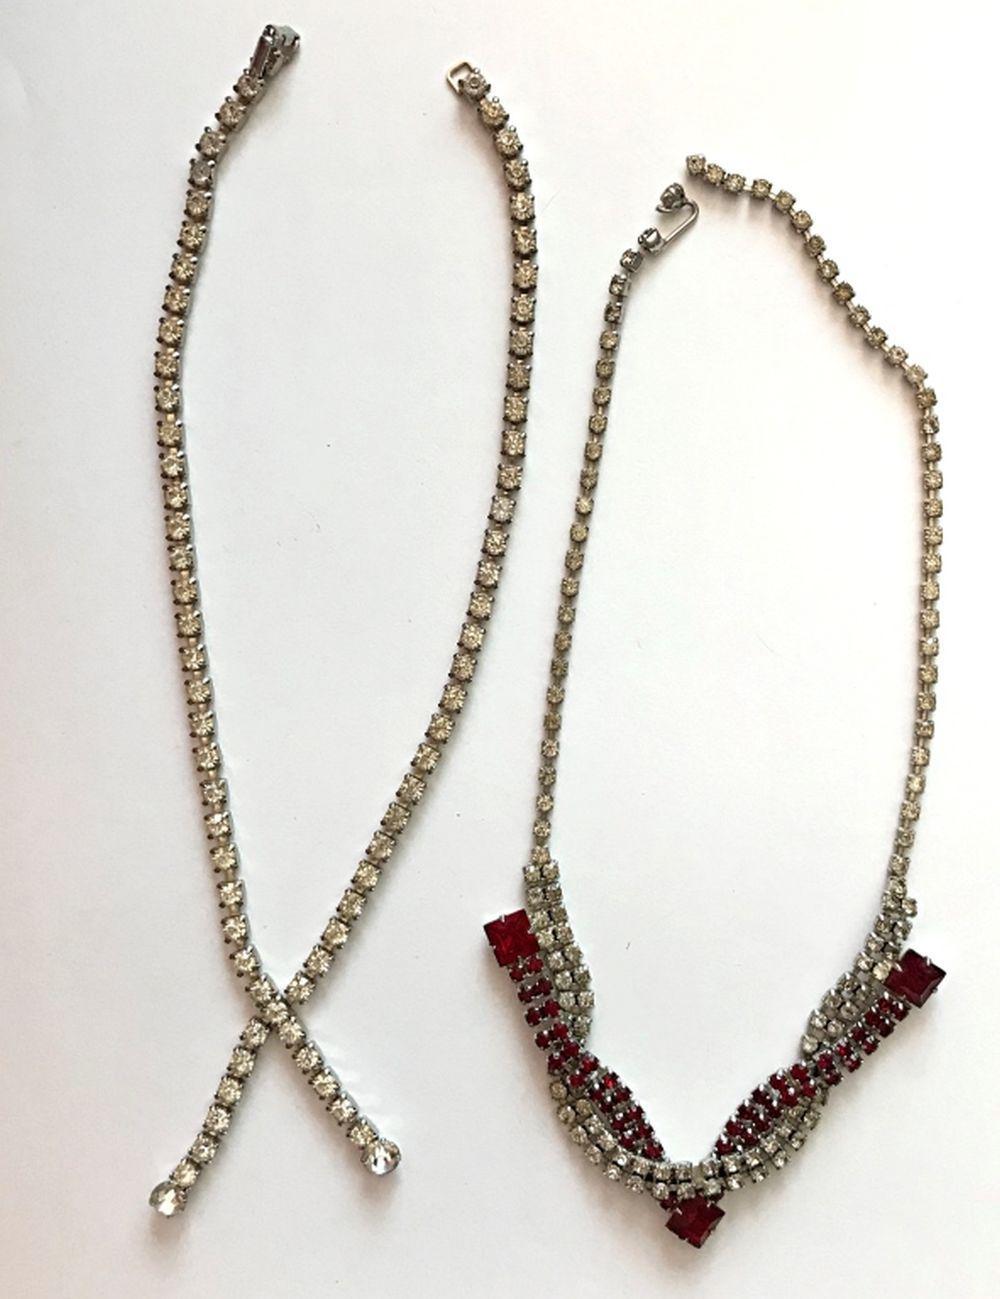 2 RHINESTONE NECKLACES (1 INCLUDES RED STONES)